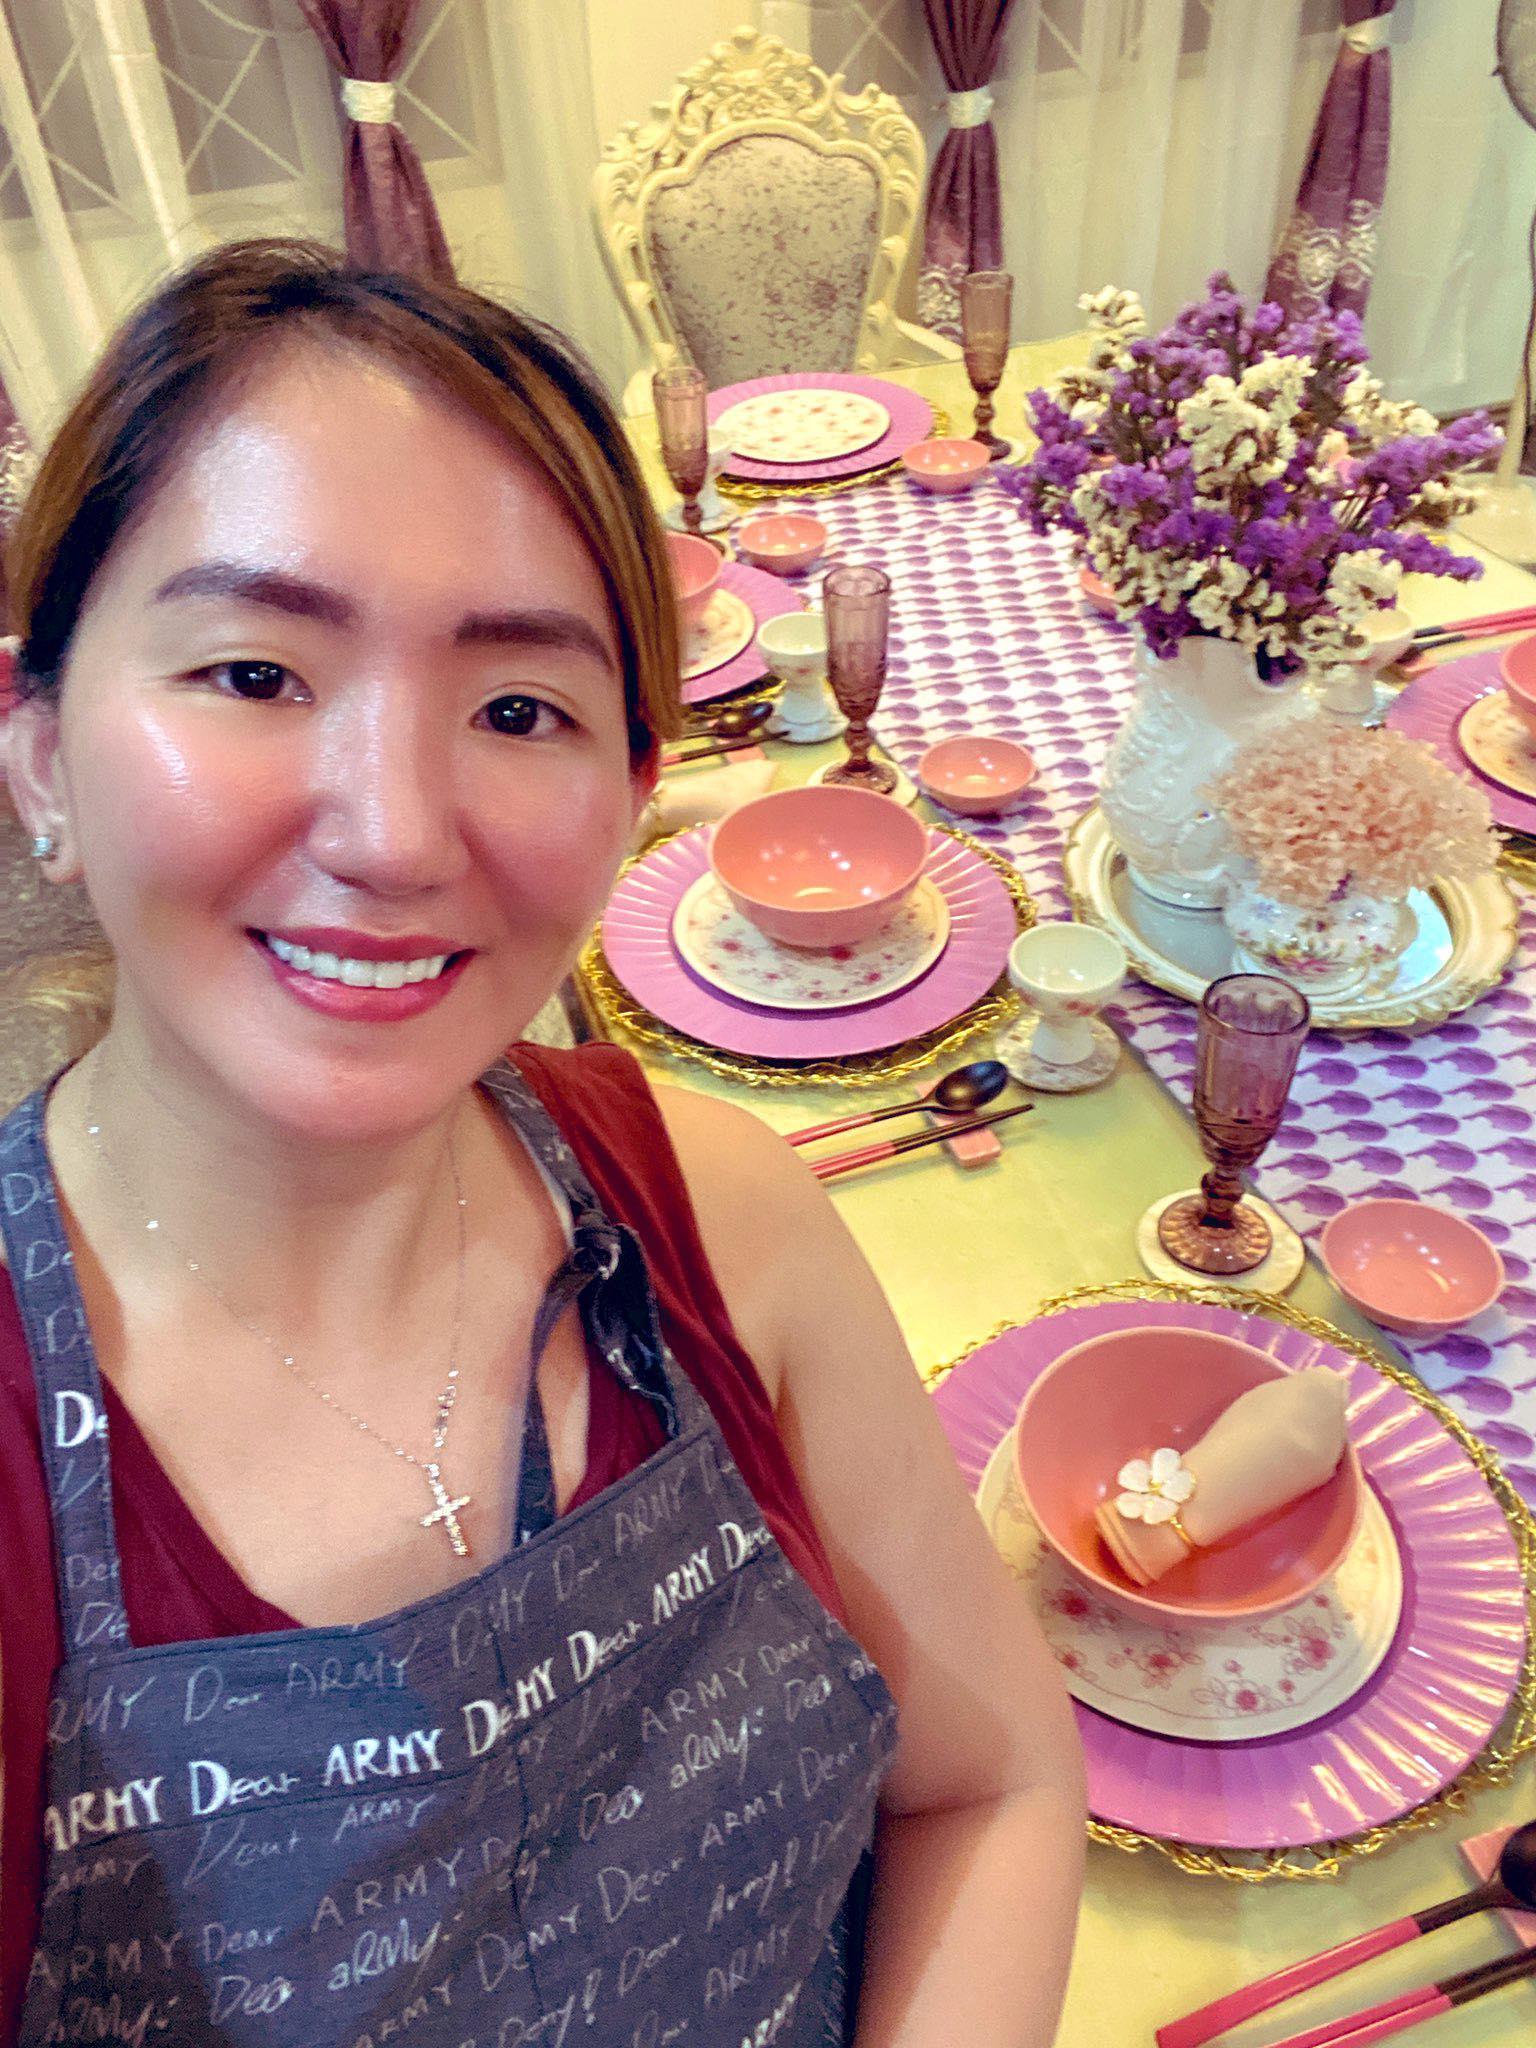 Pinay with BTS and Kwanjuyo collab dinnerware set